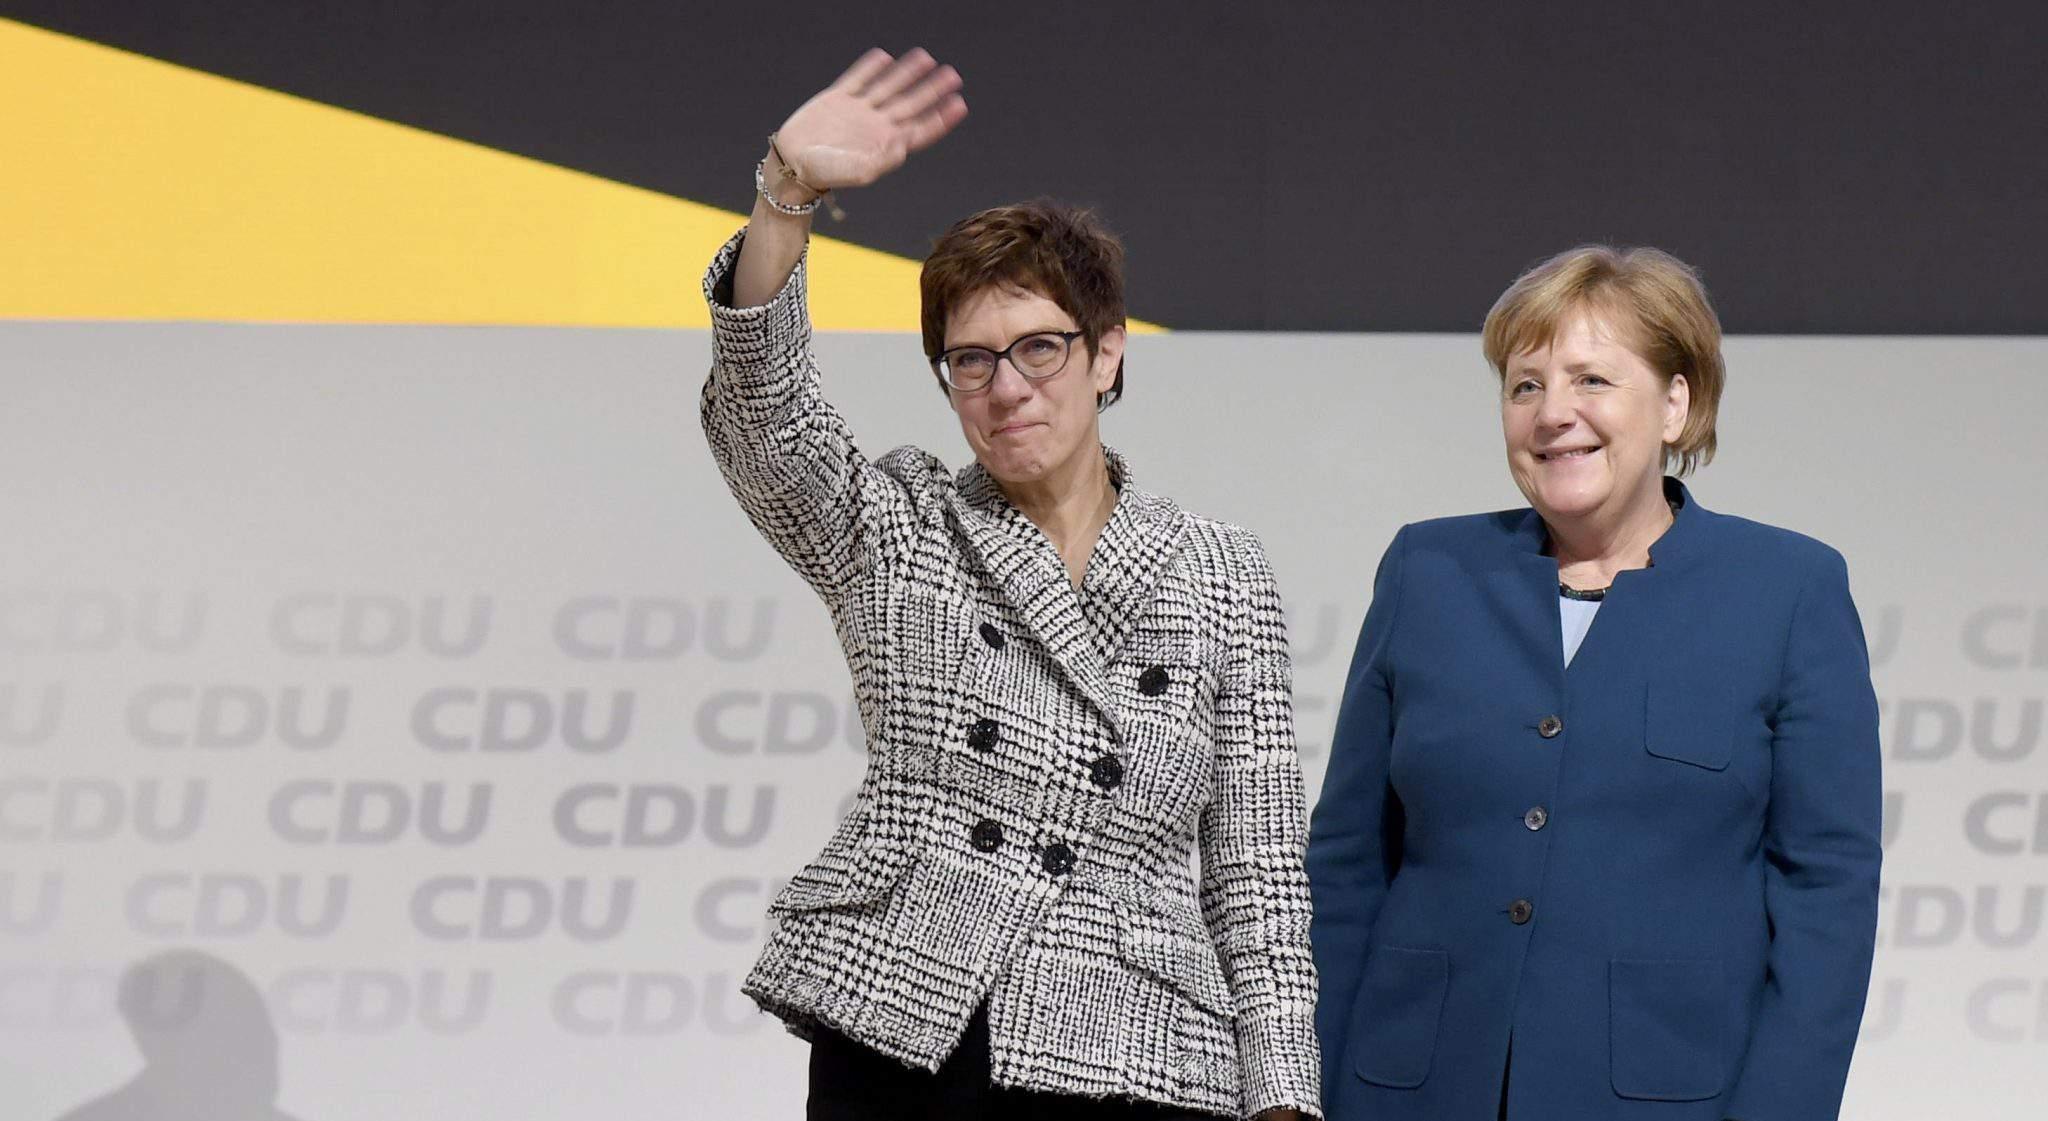 CDU Kramp-Karrenbauer